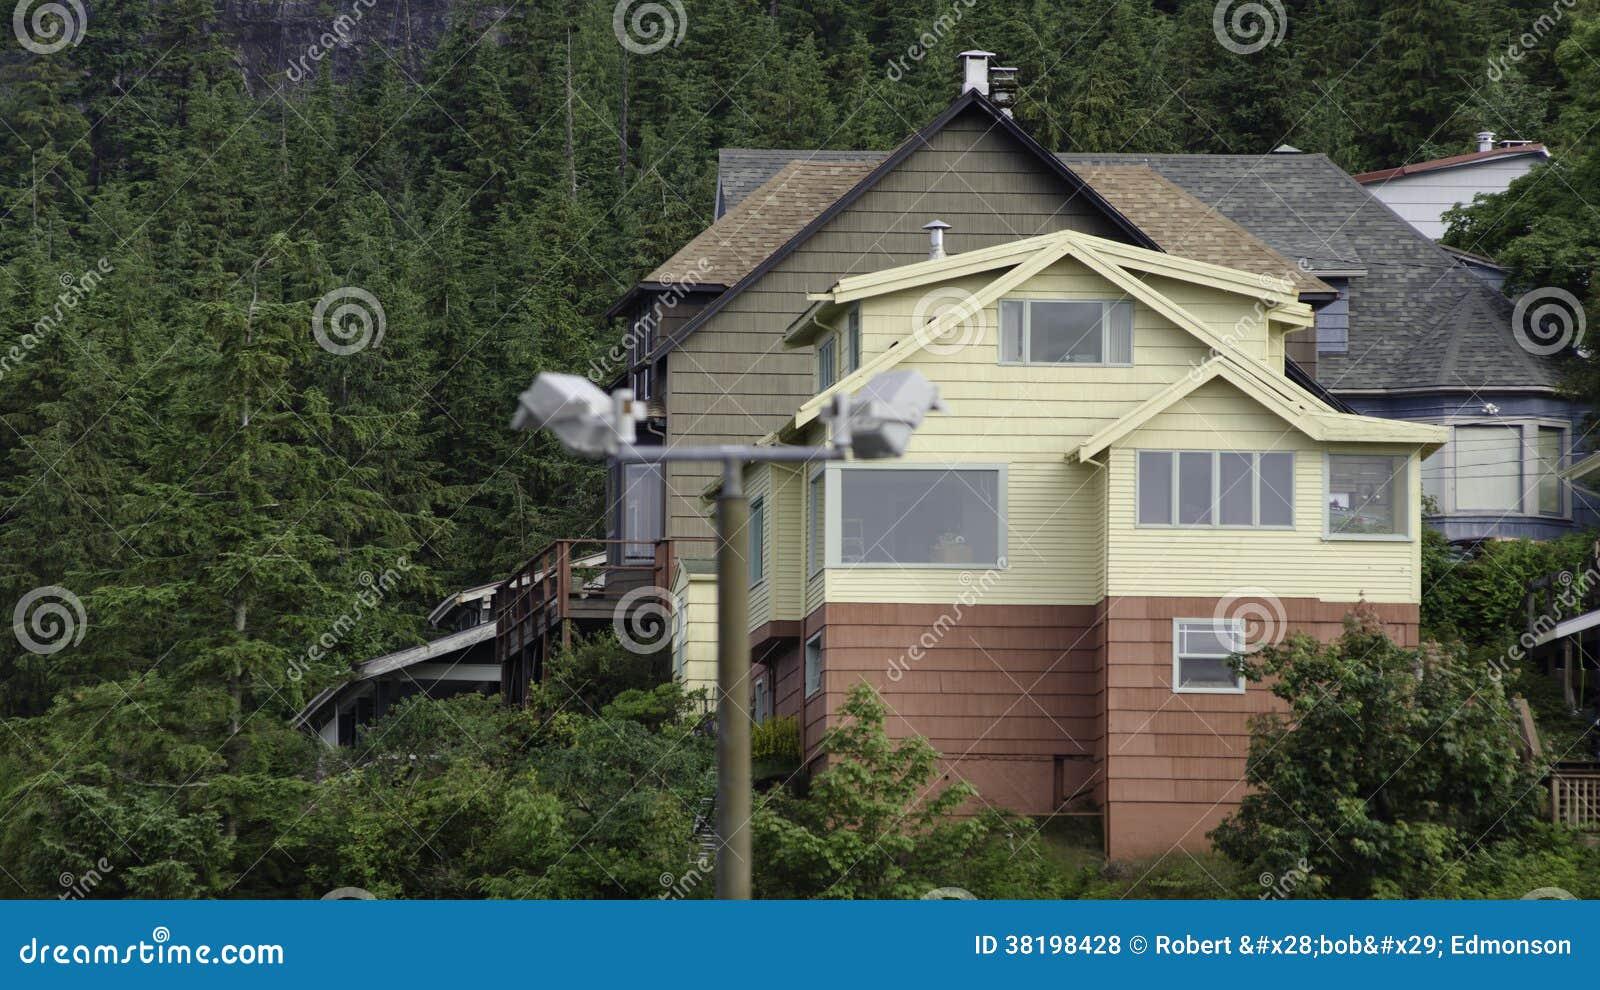 Homes in ketchikan alaska royalty free stock photos for Home builders in alaska